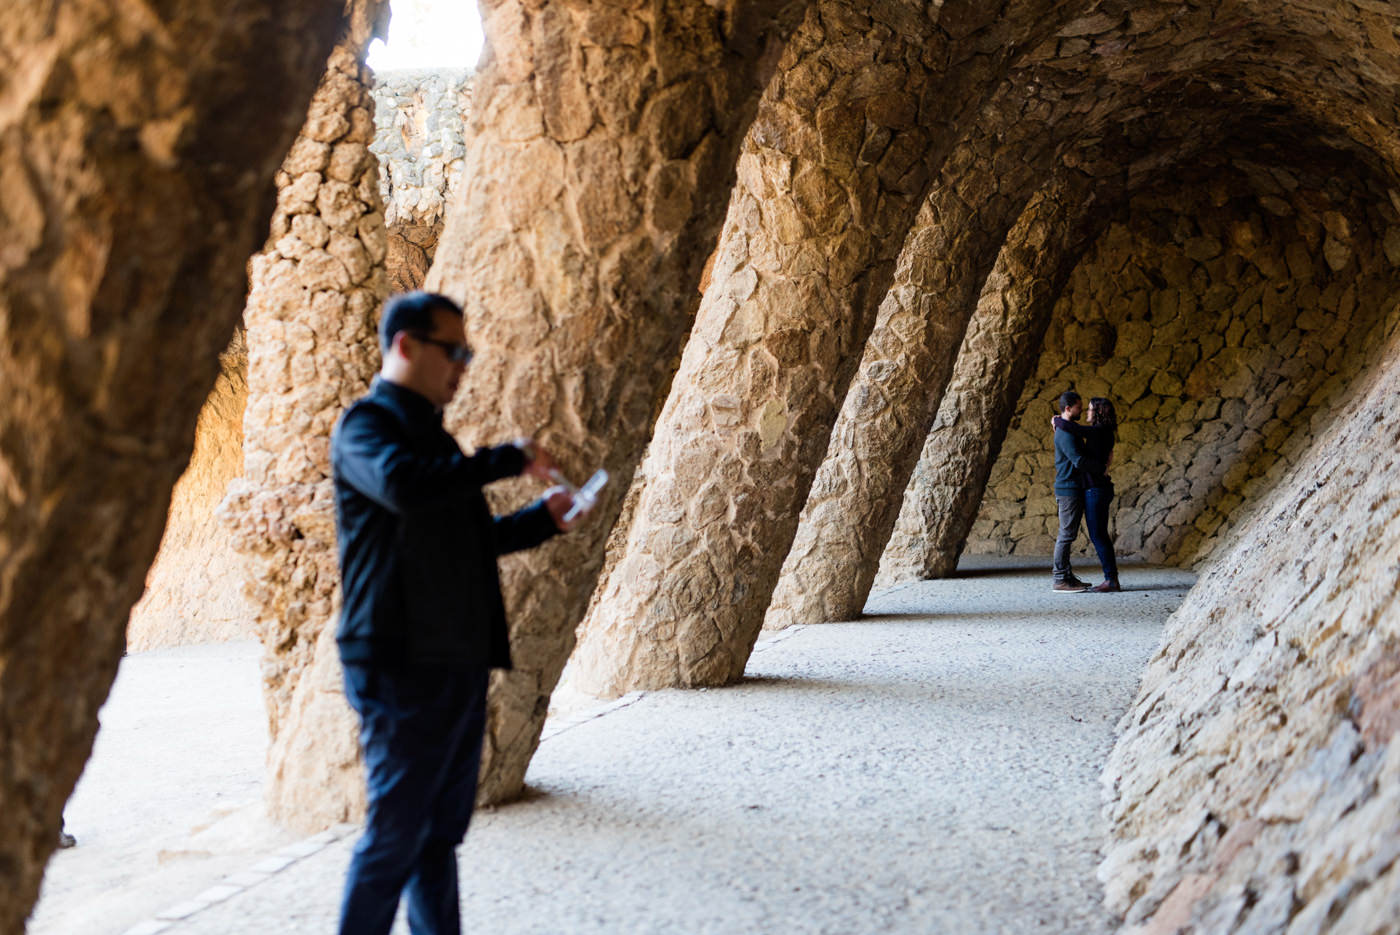 Carmel Bunkers engagement shoot Barcelona